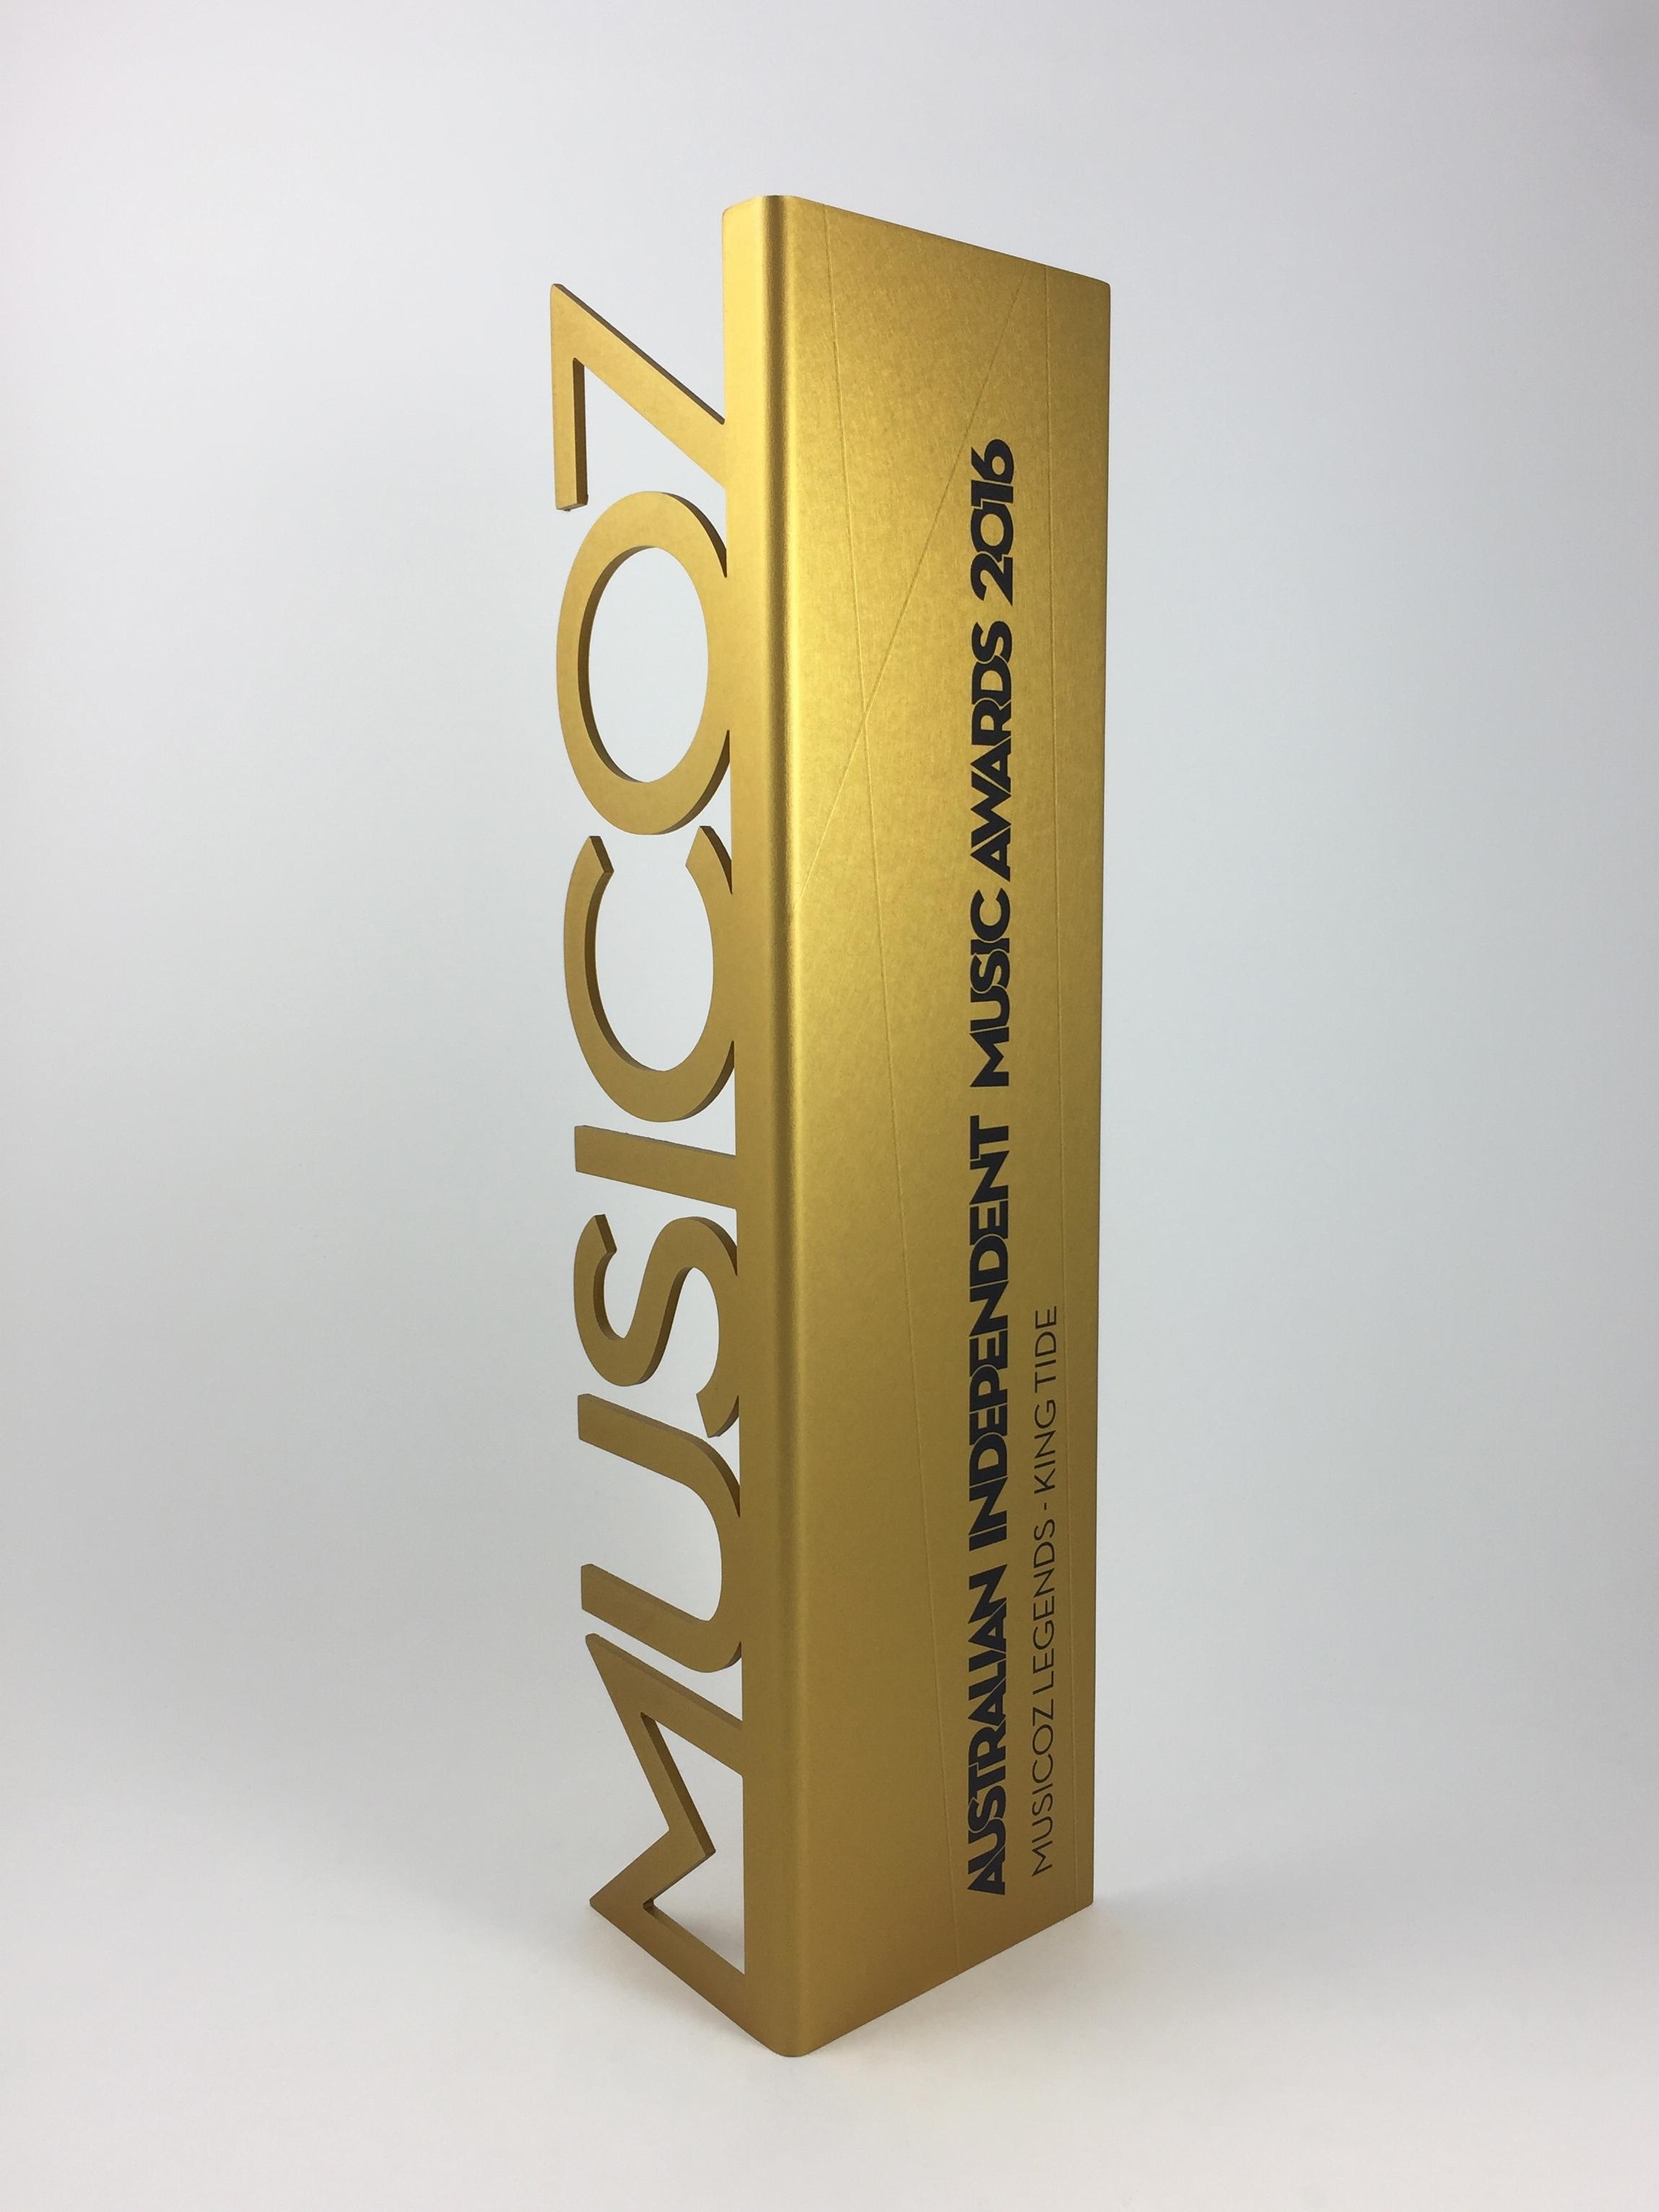 music-oz-aluminium-awards-trophy-02.jpg